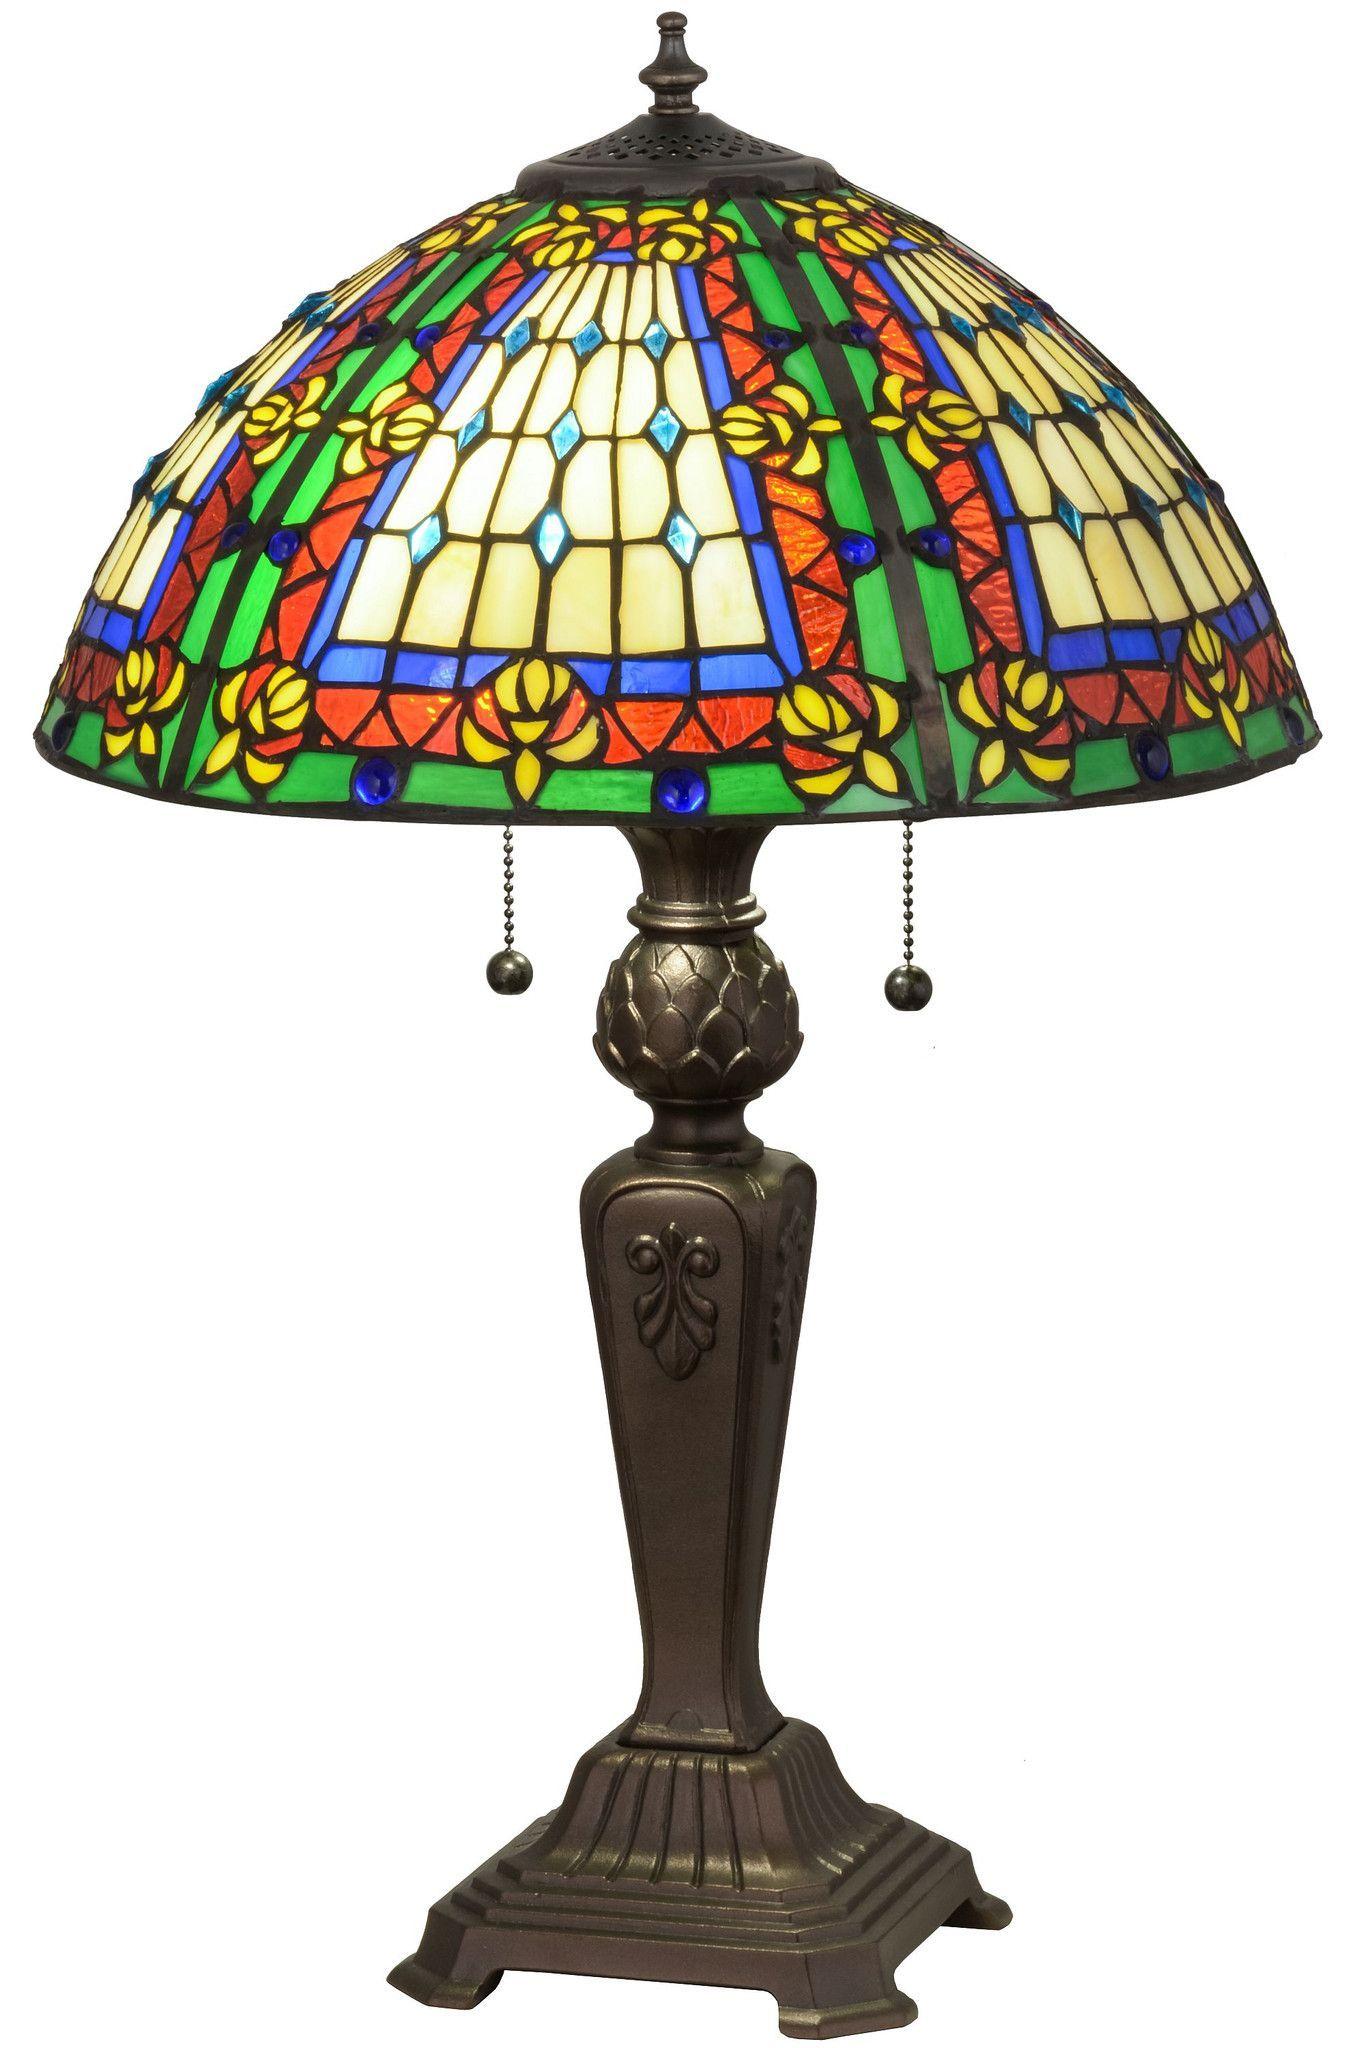 245h stained glass fleur de lis table lamp products 245h fleur de lis table lamp geotapseo Gallery